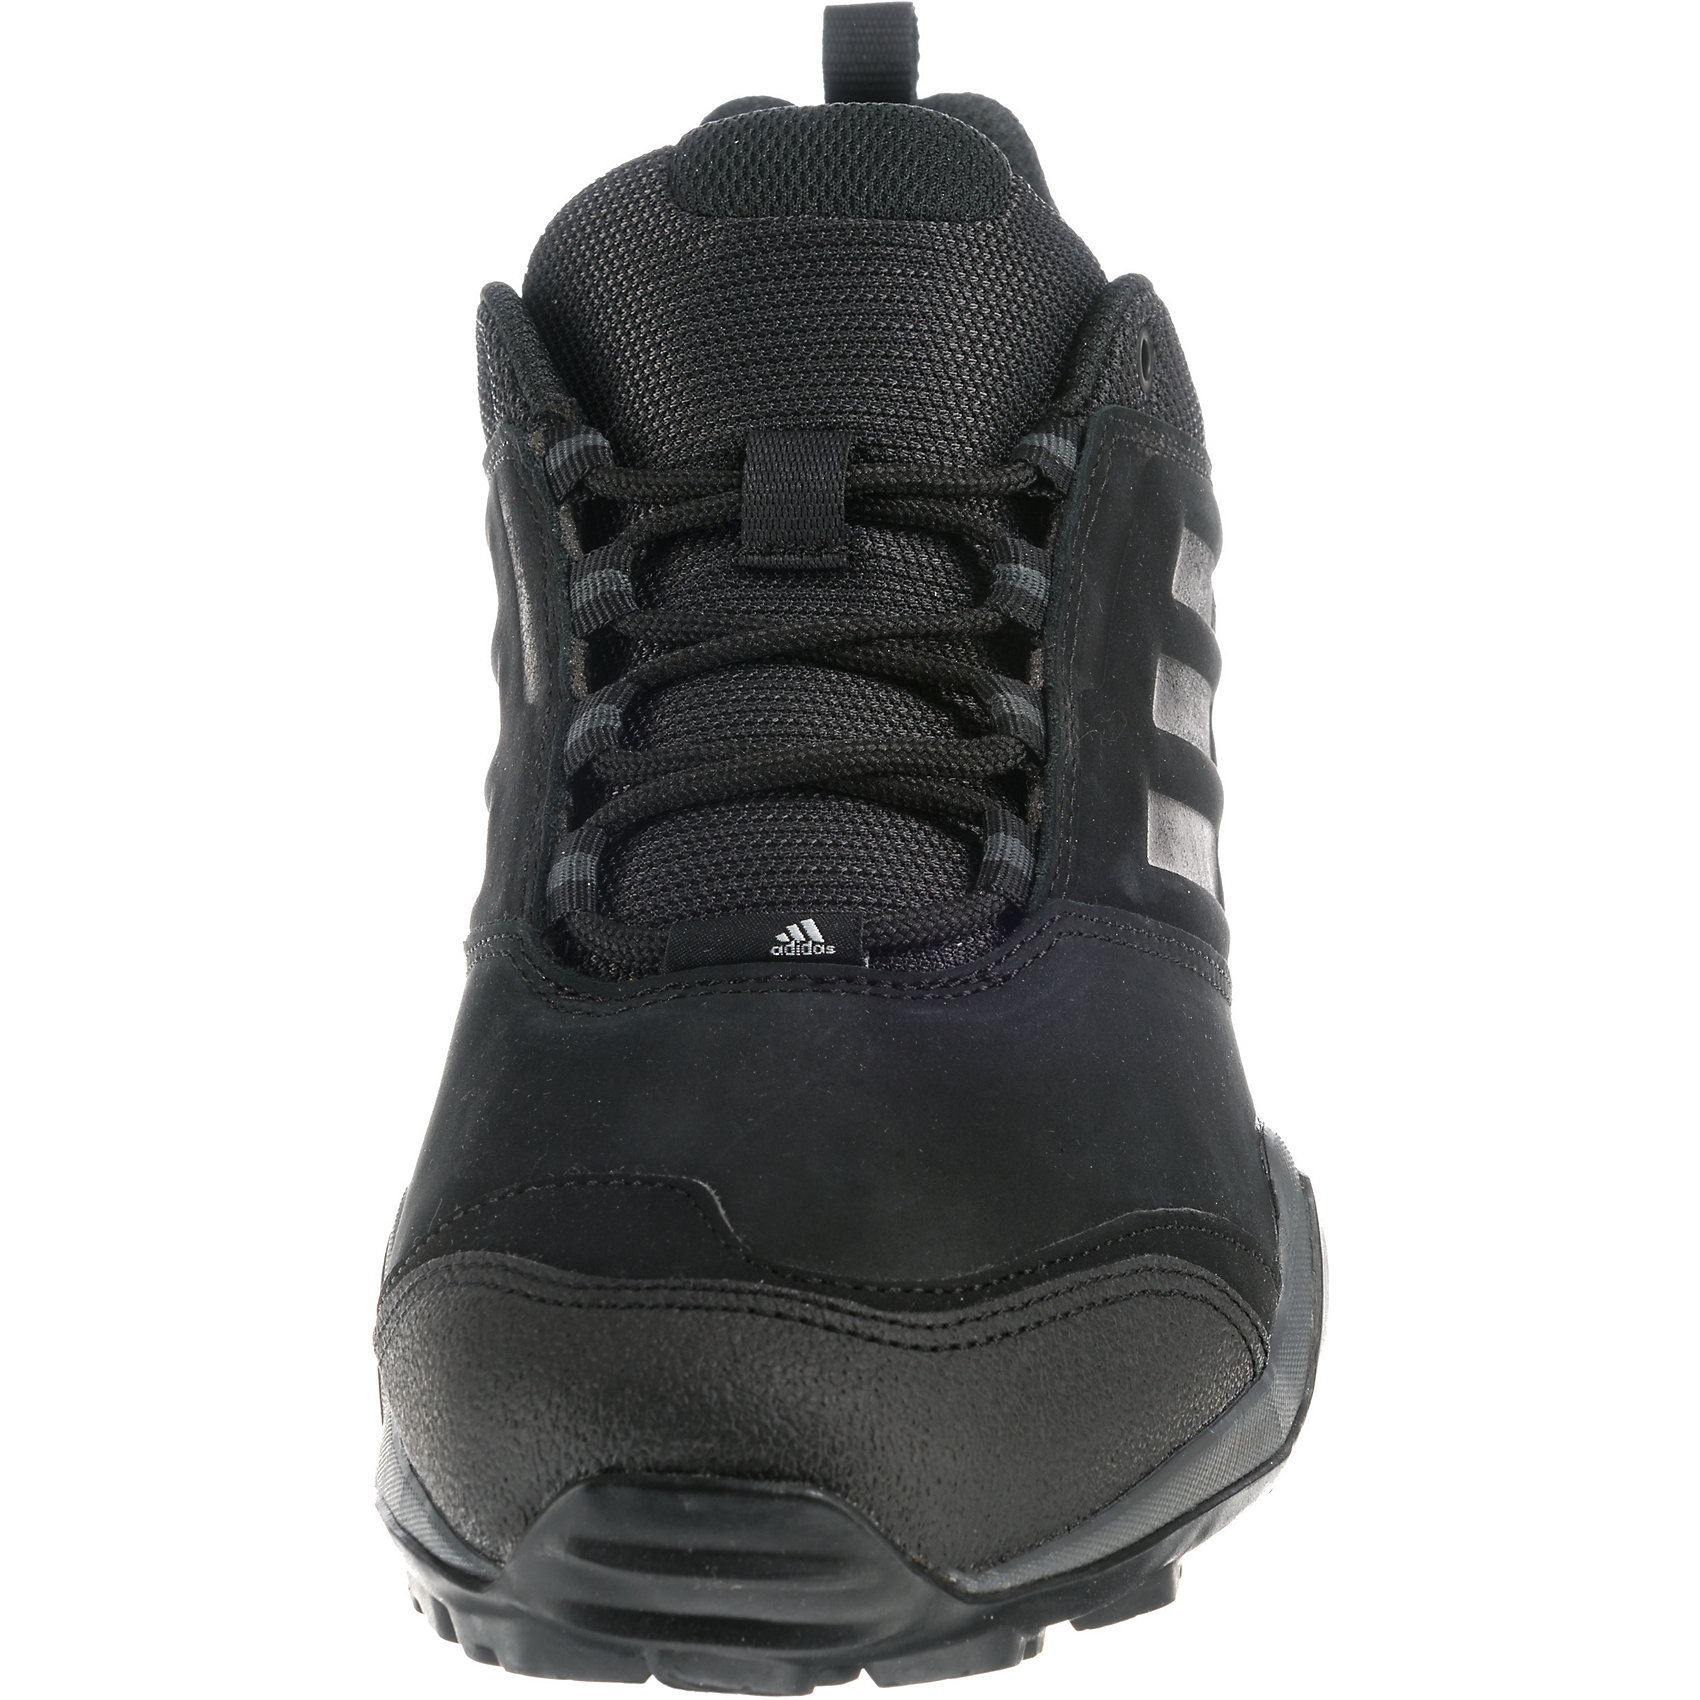 Neu adidas Performance TERREX BRUSHWOOD LEATHER Trekkingschuhe Trekkingschuhe Trekkingschuhe 8370438 436480